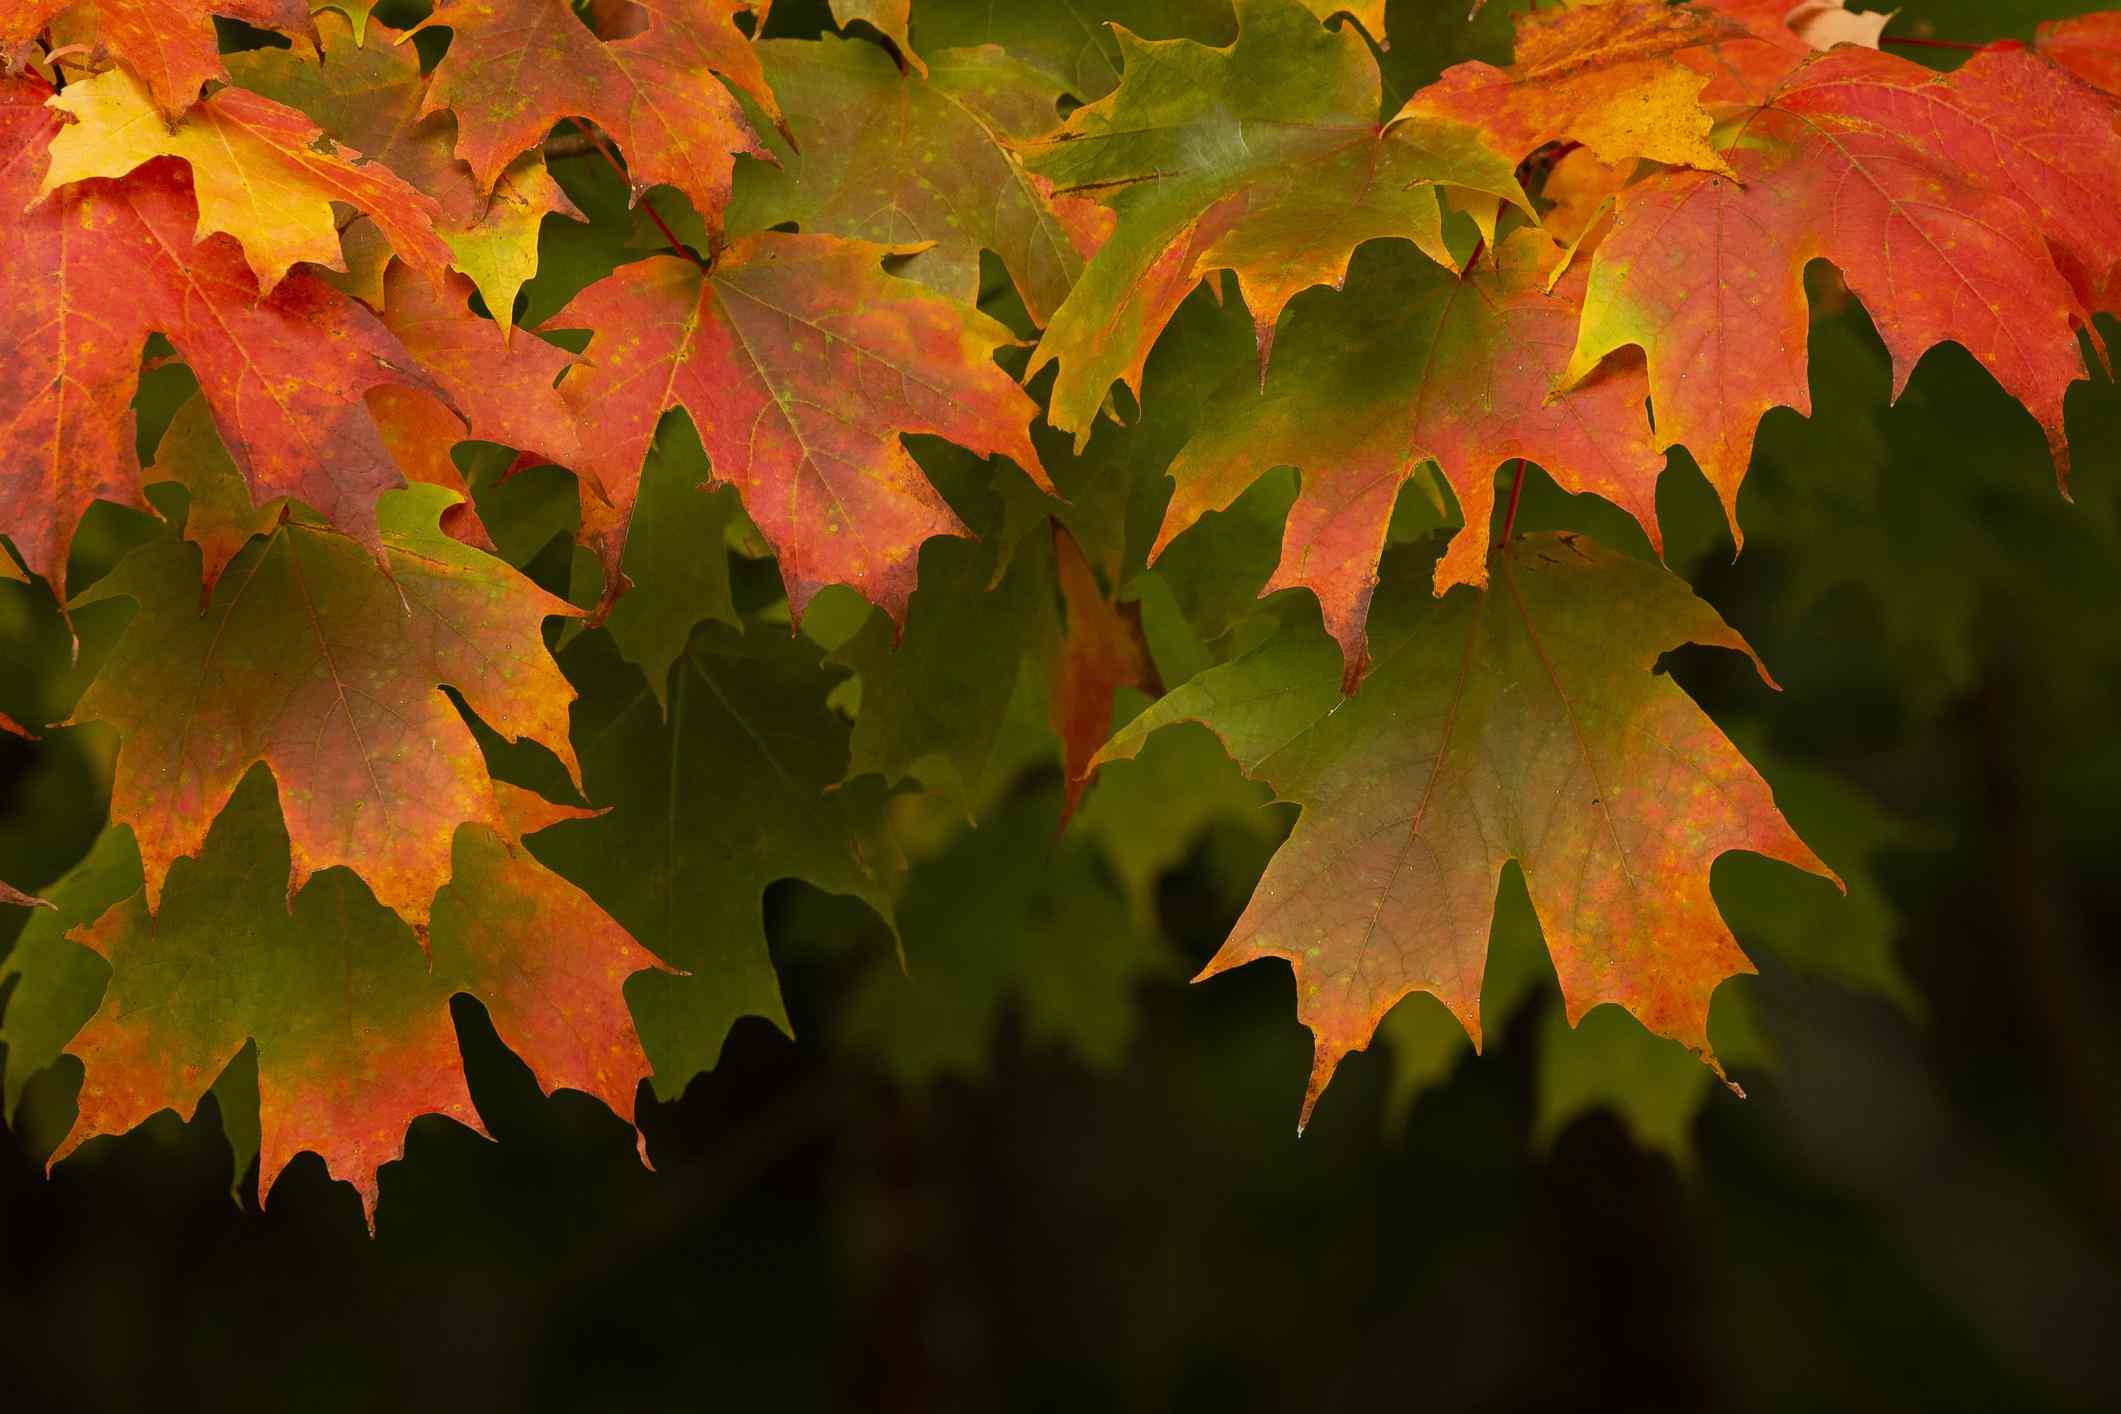 Sugar Maple tree leaves turning red.